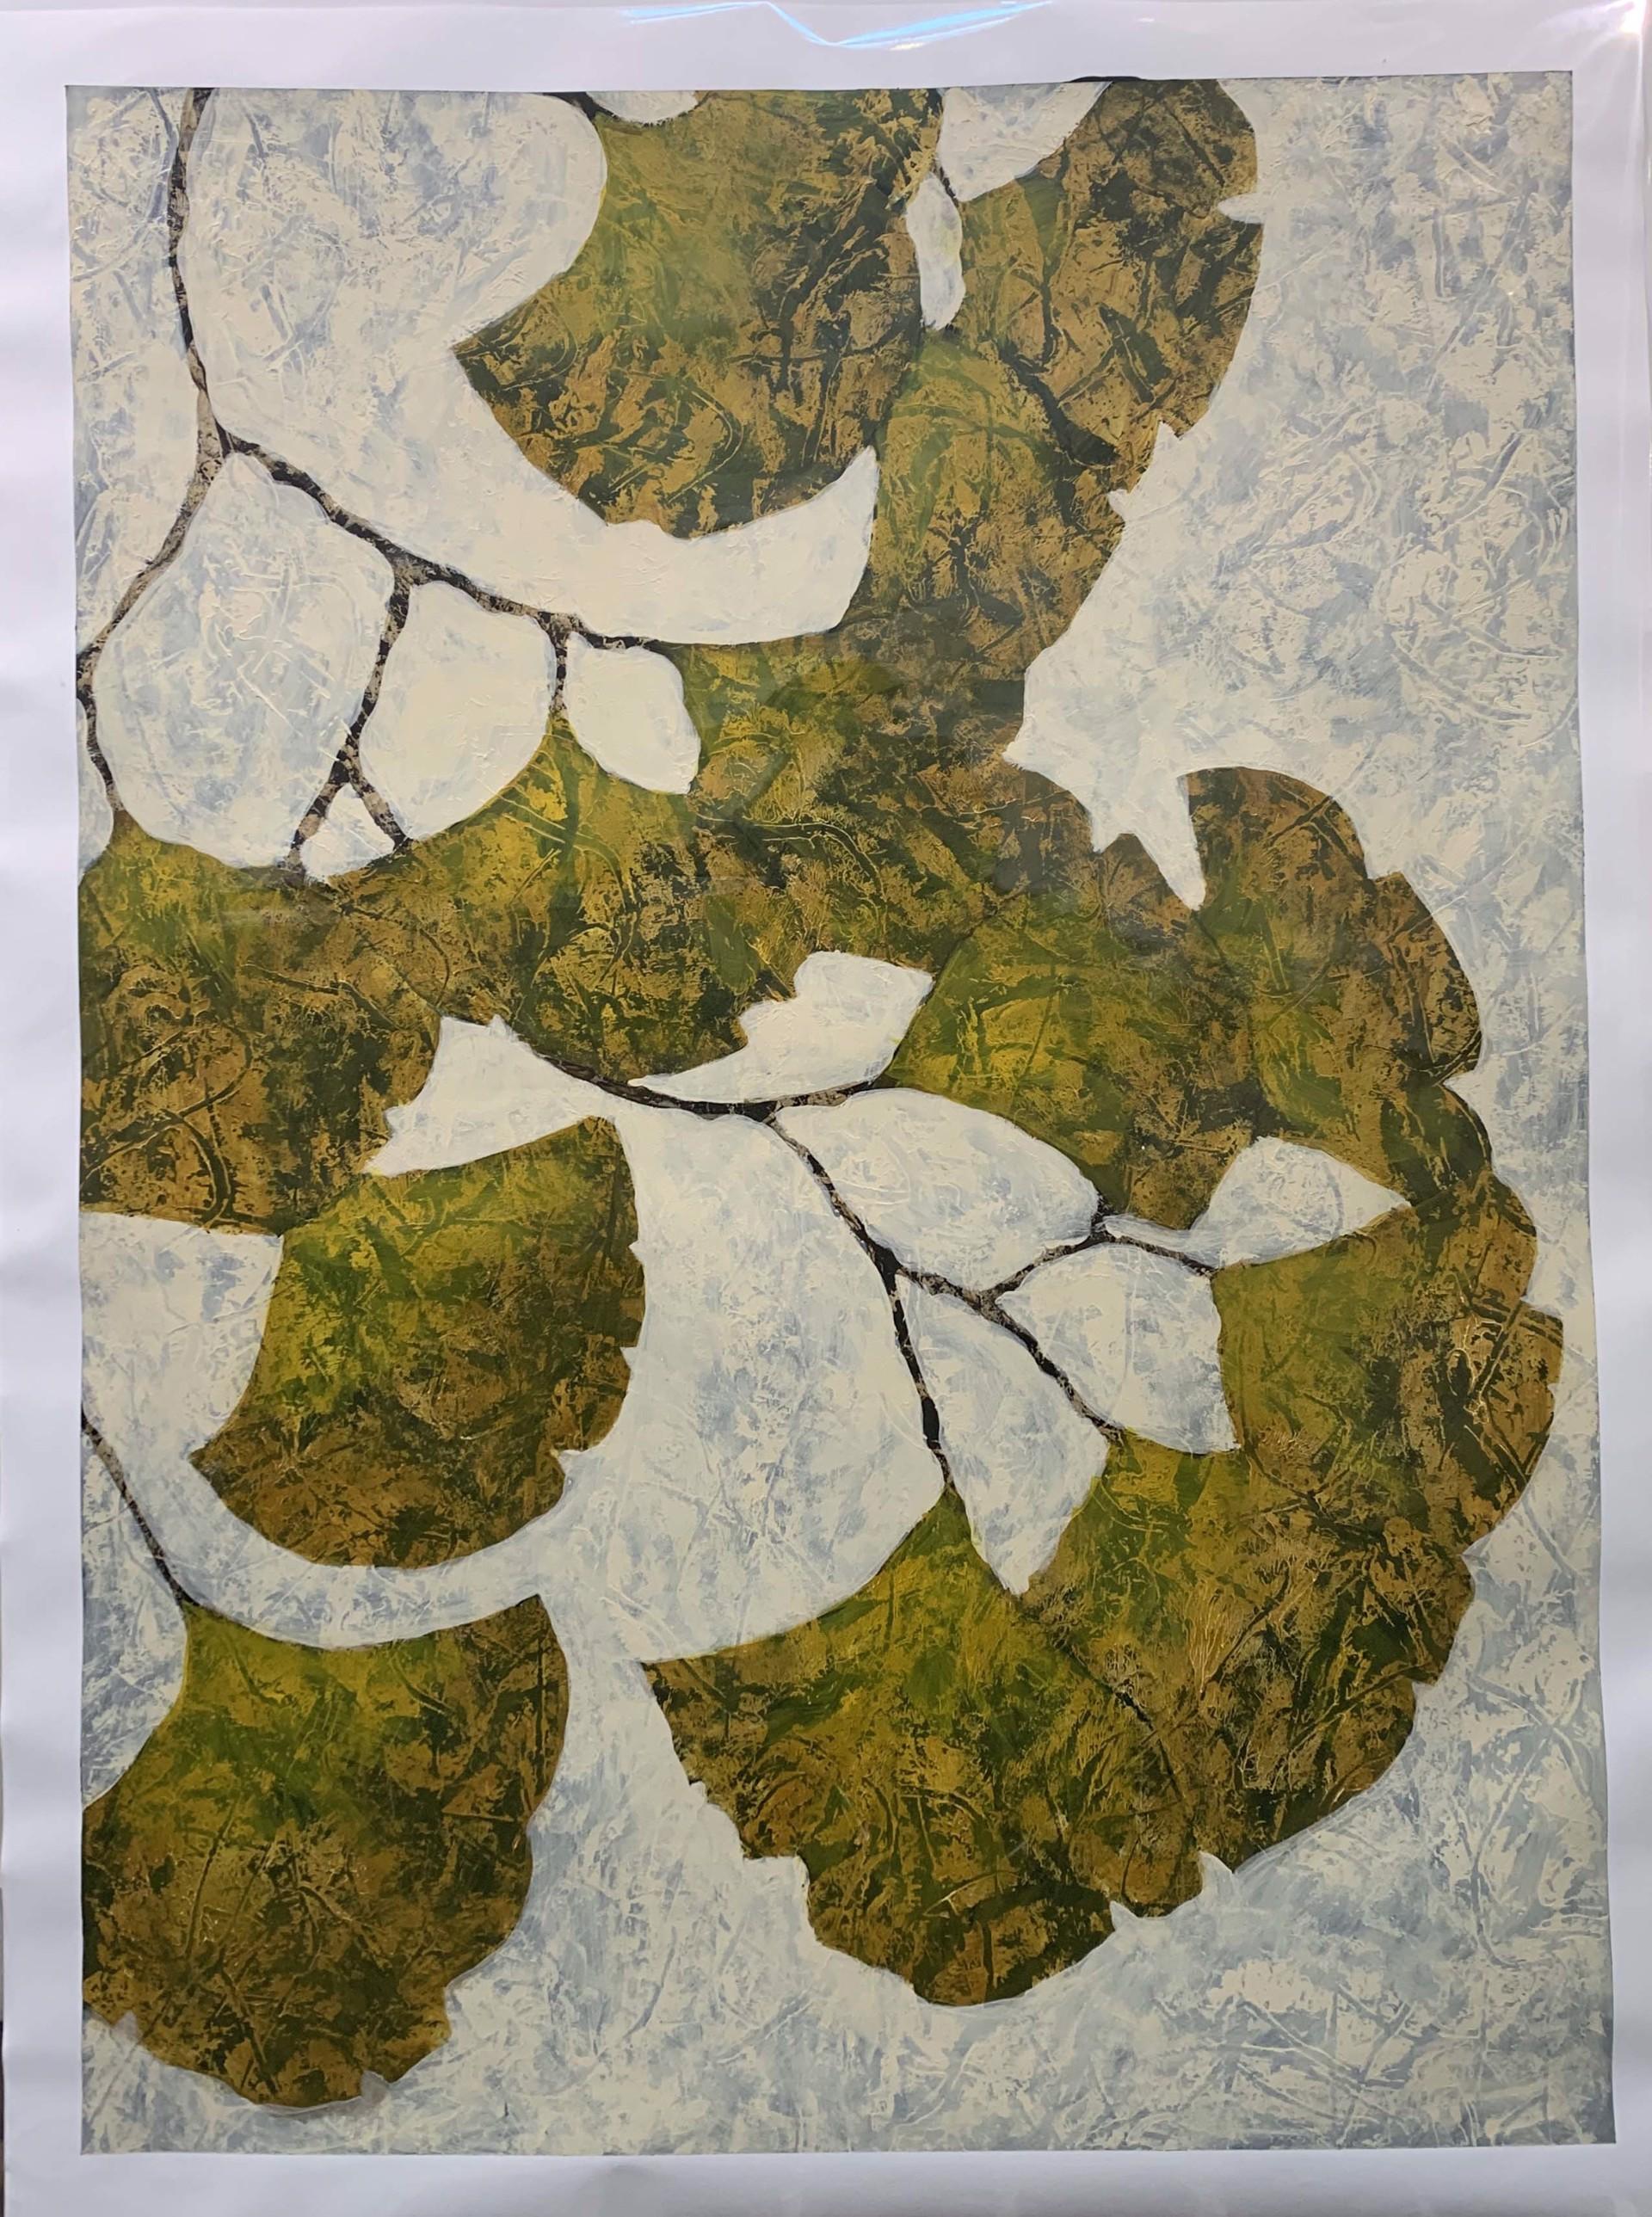 Ginkgo Aureum by John Townsend